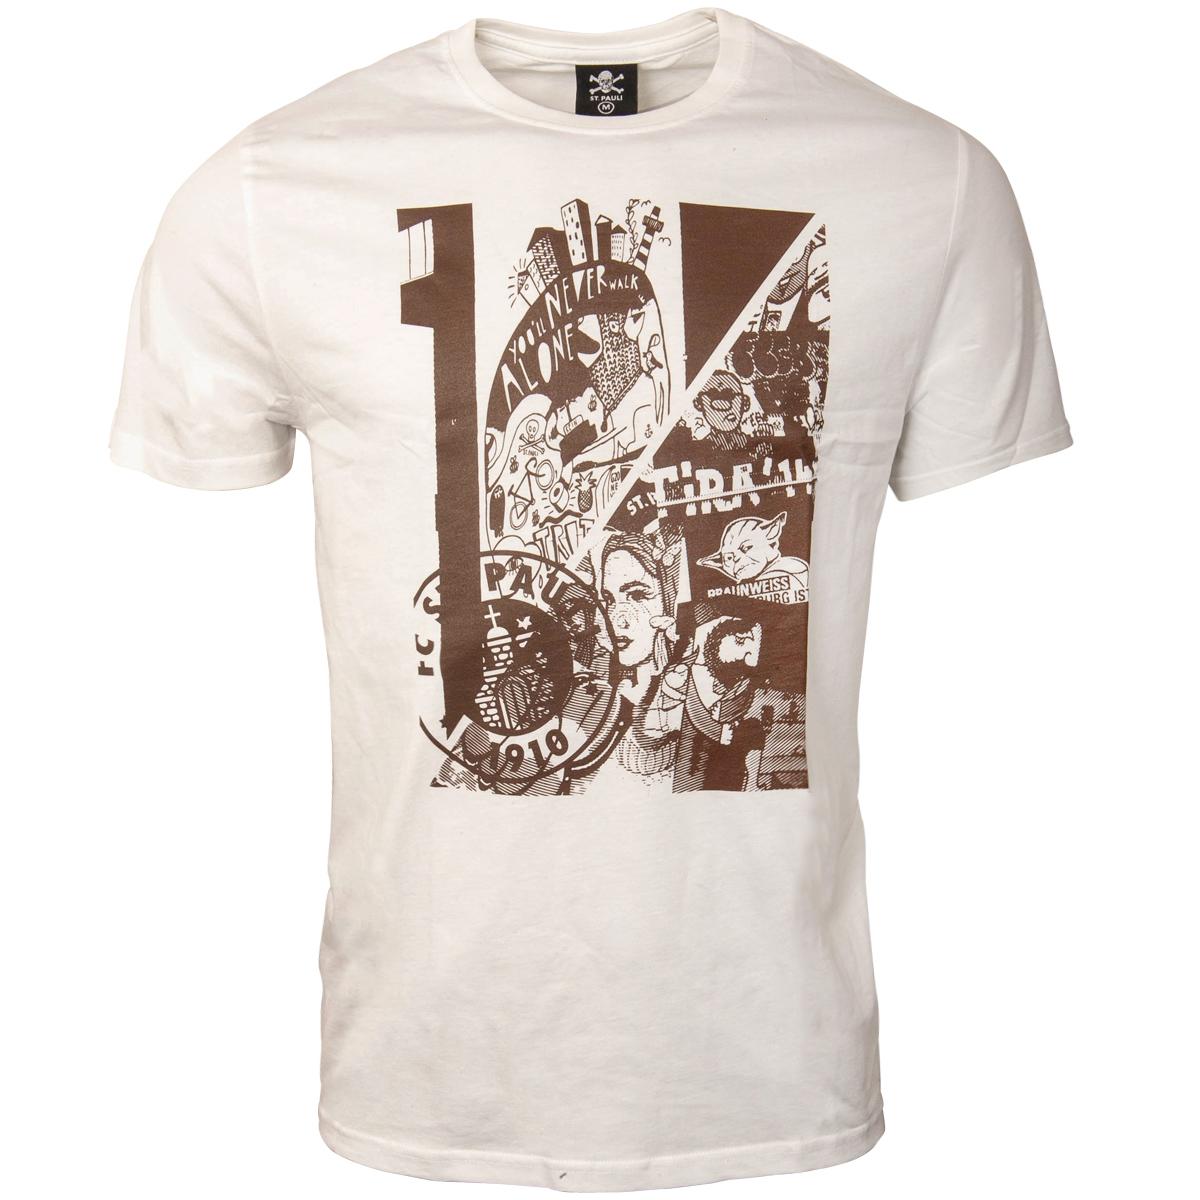 9d66783c392b0 FC St. Pauli - White T-Shirt Art | ROCKnSHOP